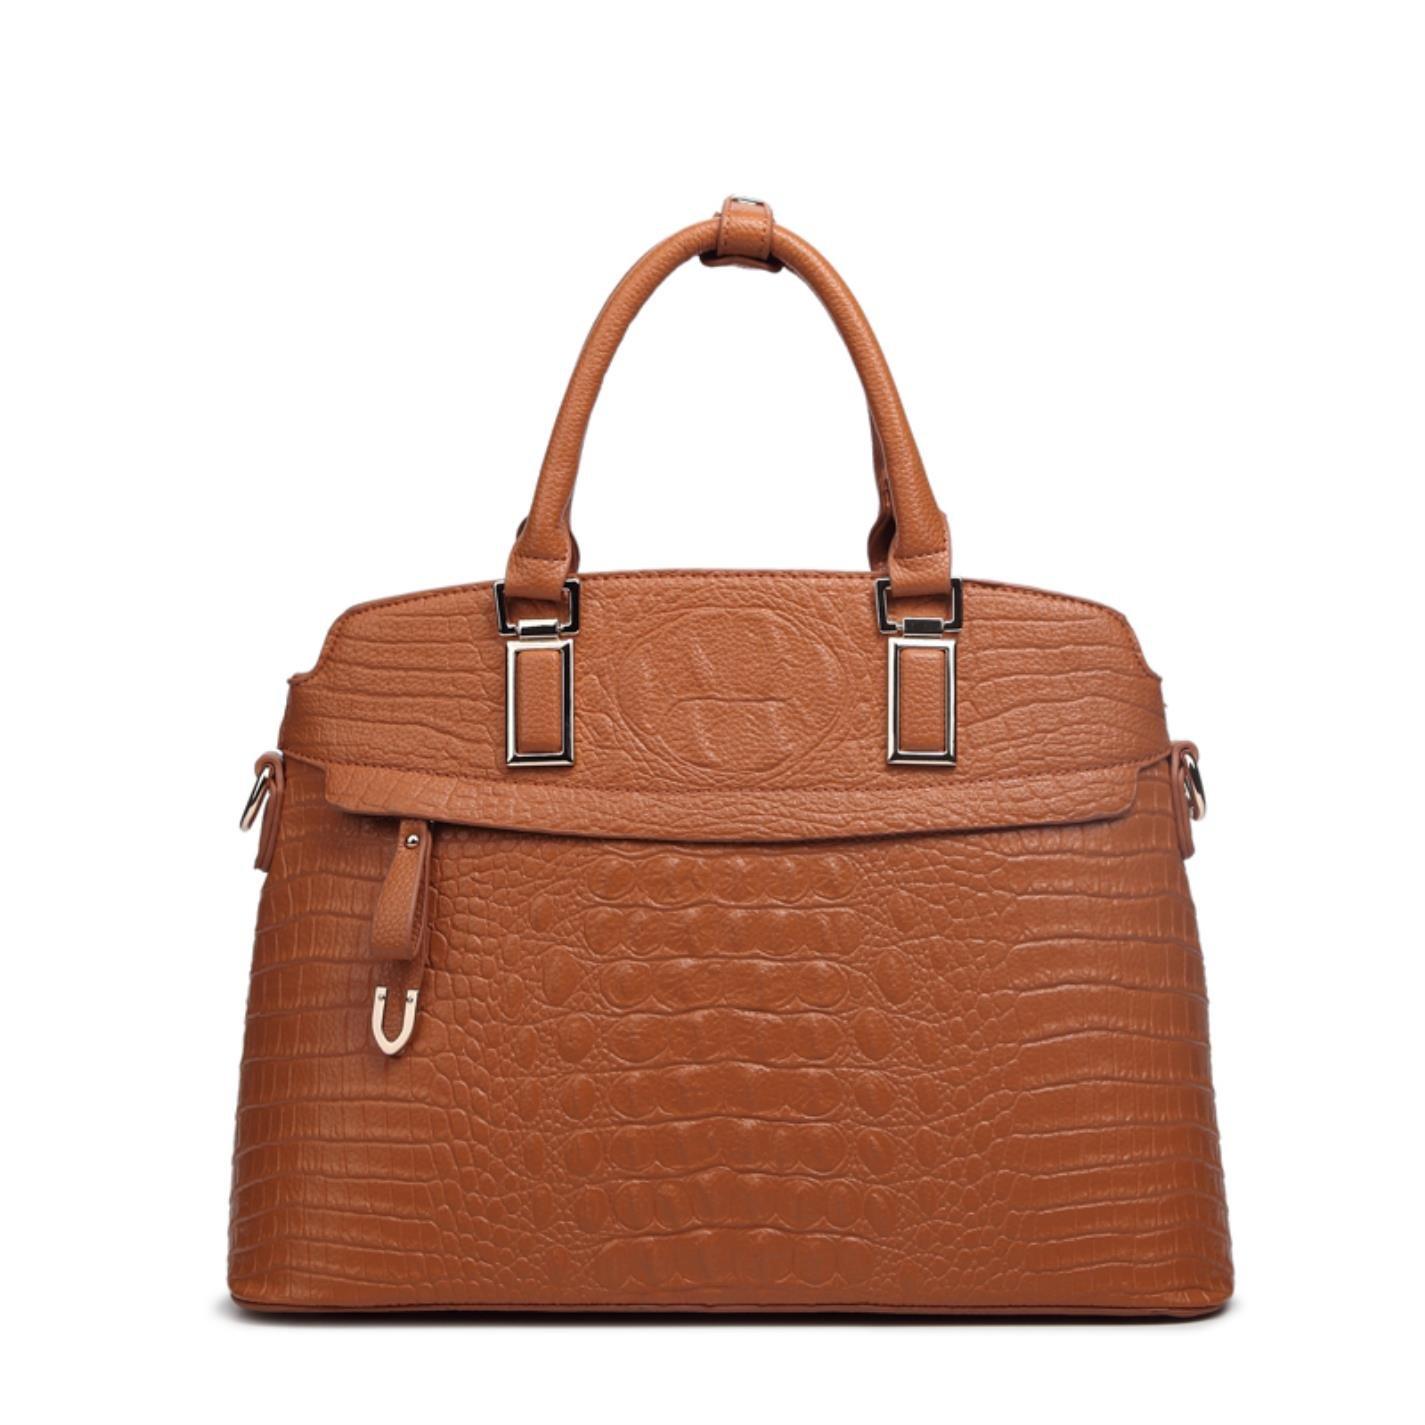 Women Messenger Bags Casual Tote Femme Luxury Shoulder Handbags